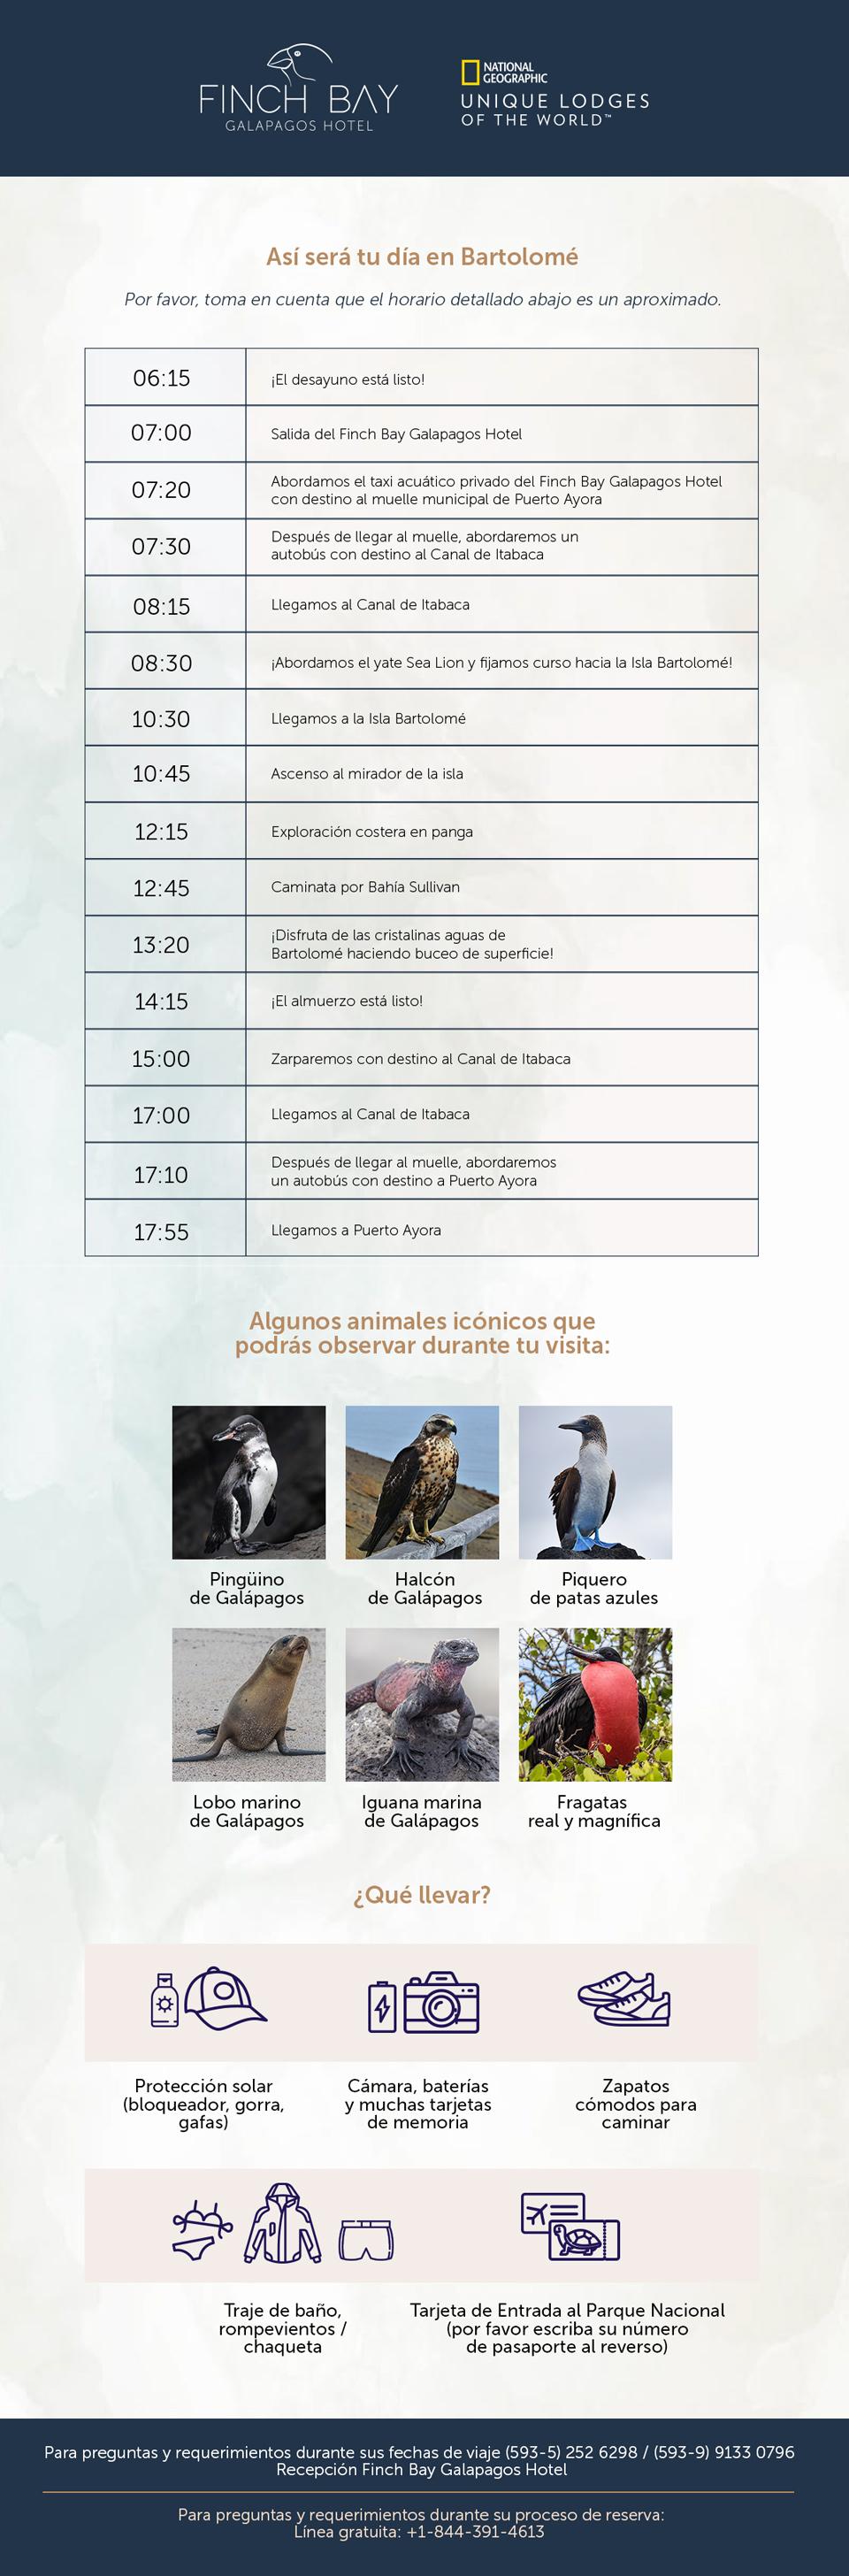 Itinerario Yate Sea Lion: Isla Bartolomé